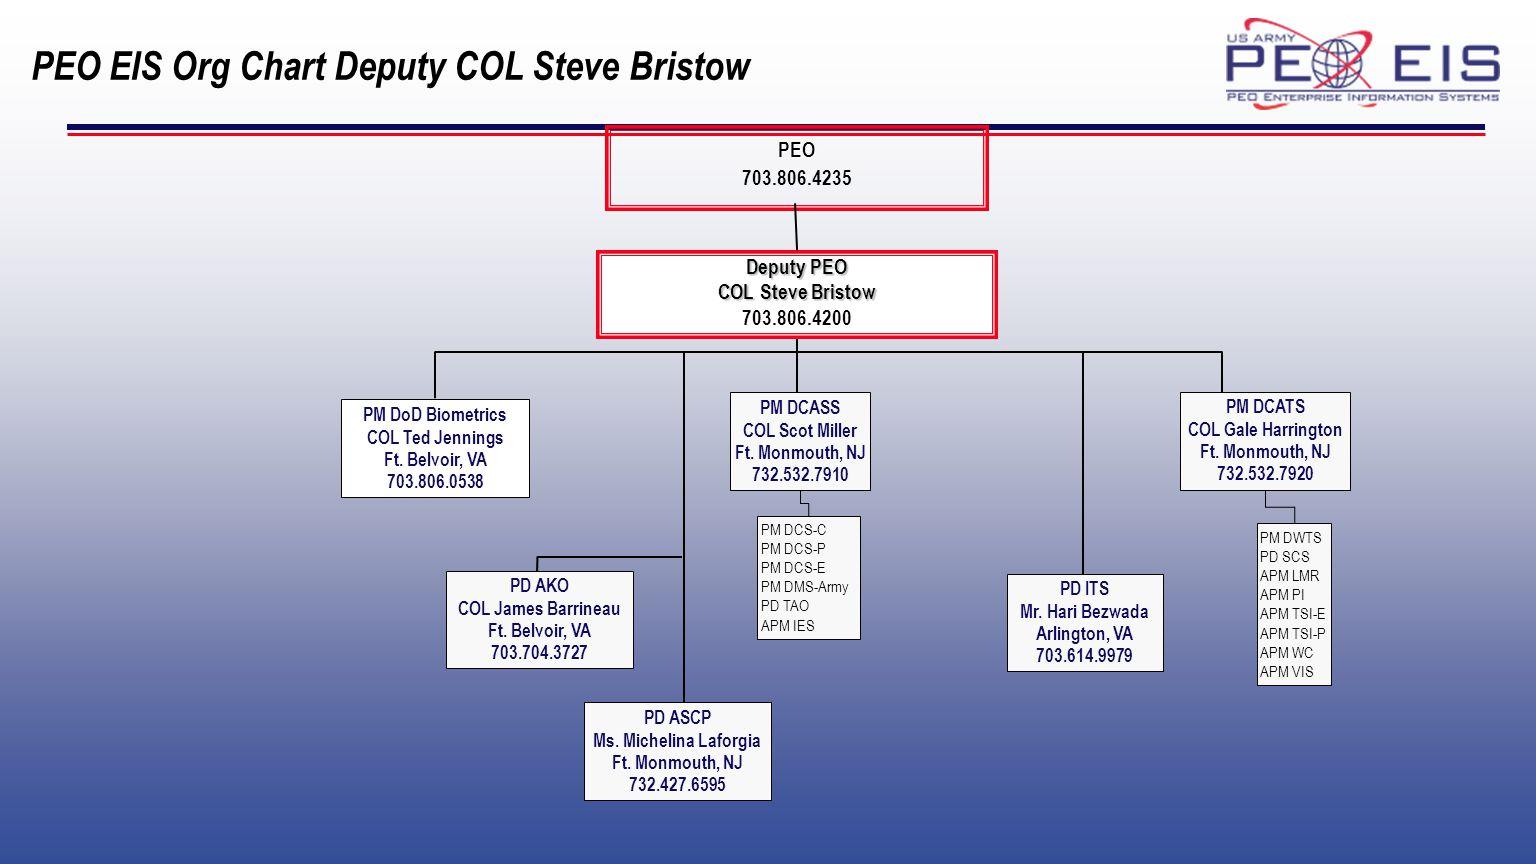 PEO EIS Org Chart Deputy COL Steve Bristow